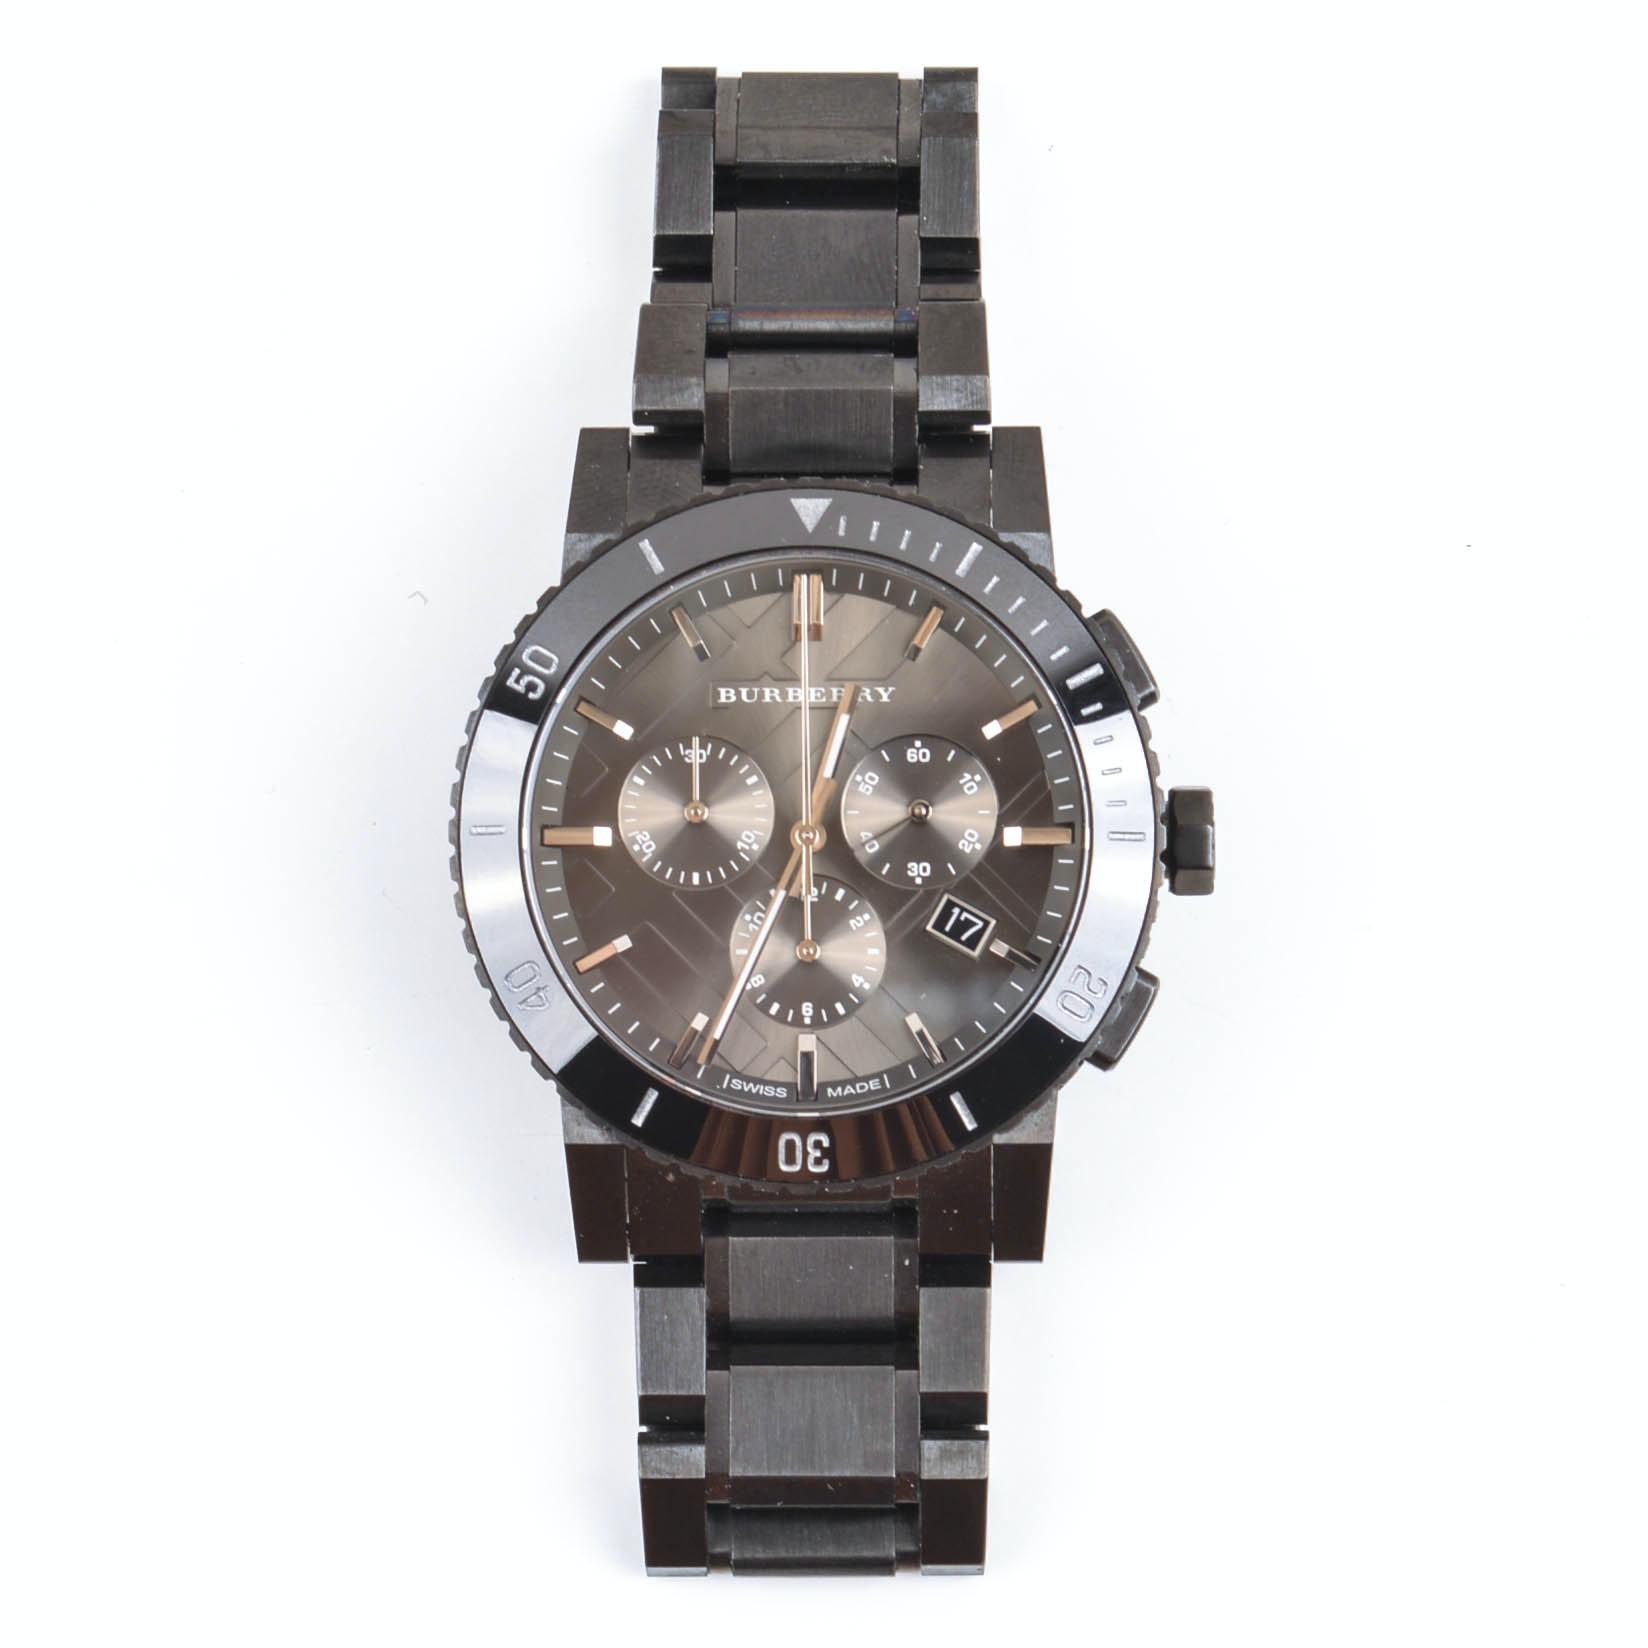 Burberry Stainless Steel Swiss Made Wristwatch